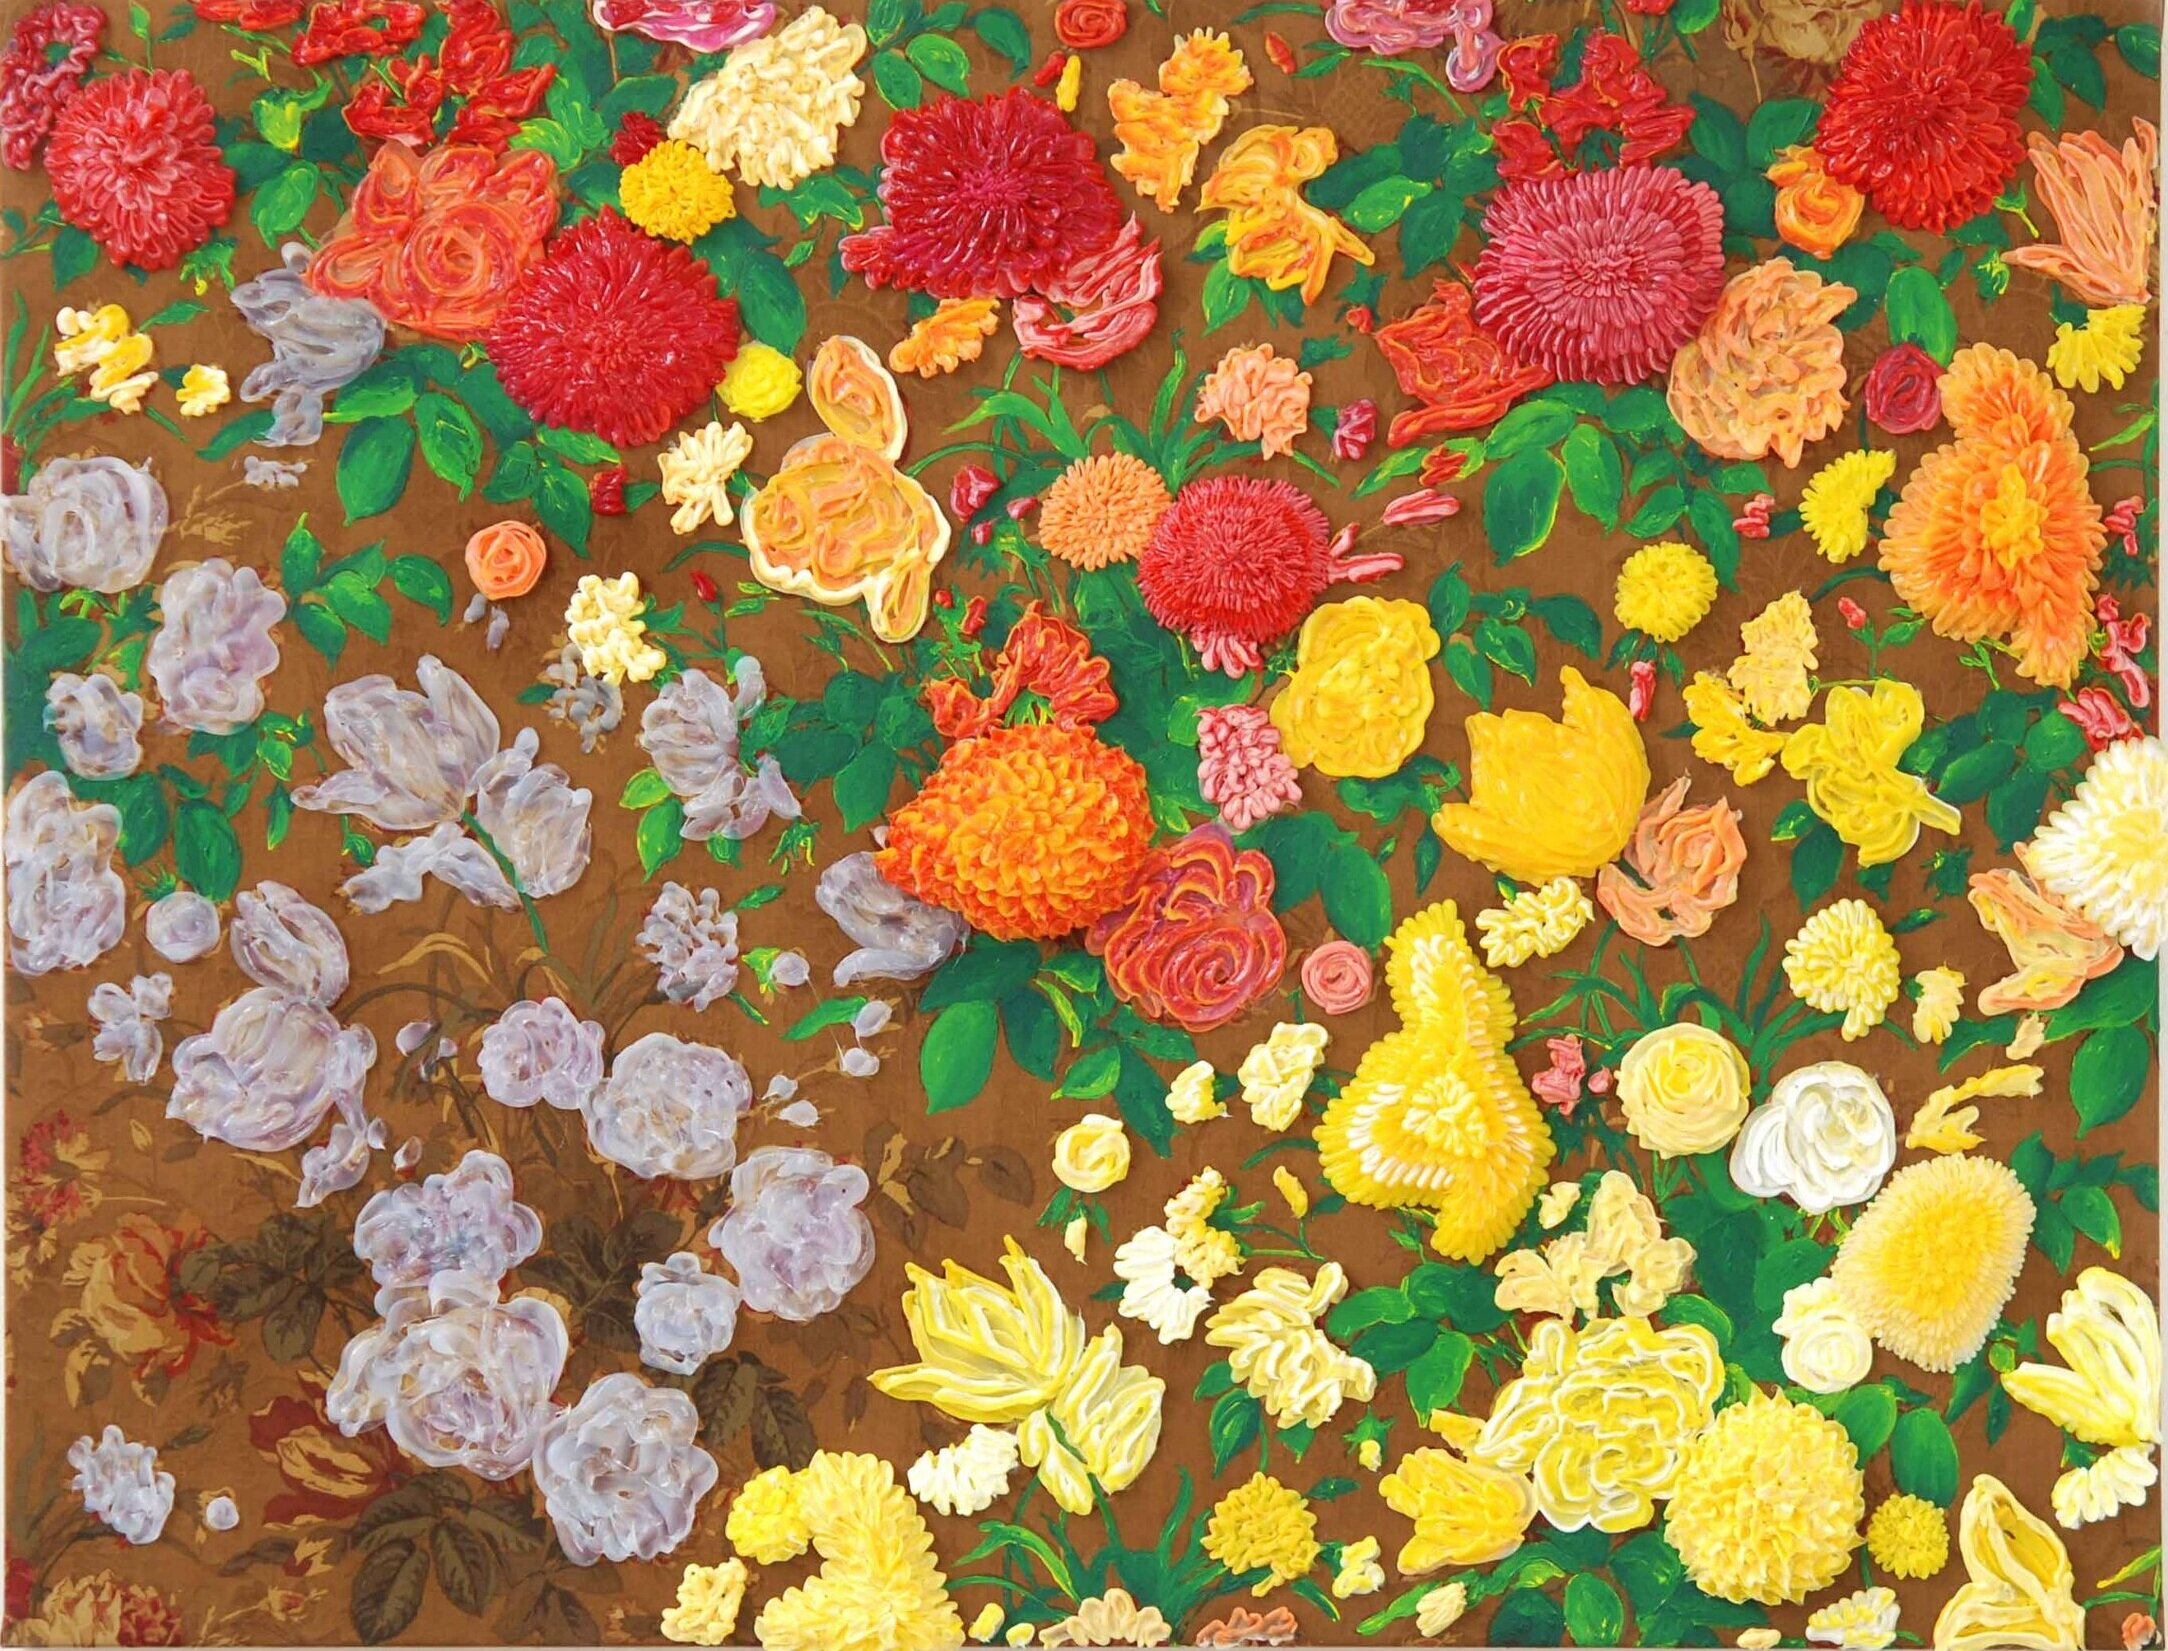 Arjan van Arendonk,  Flowers on the move